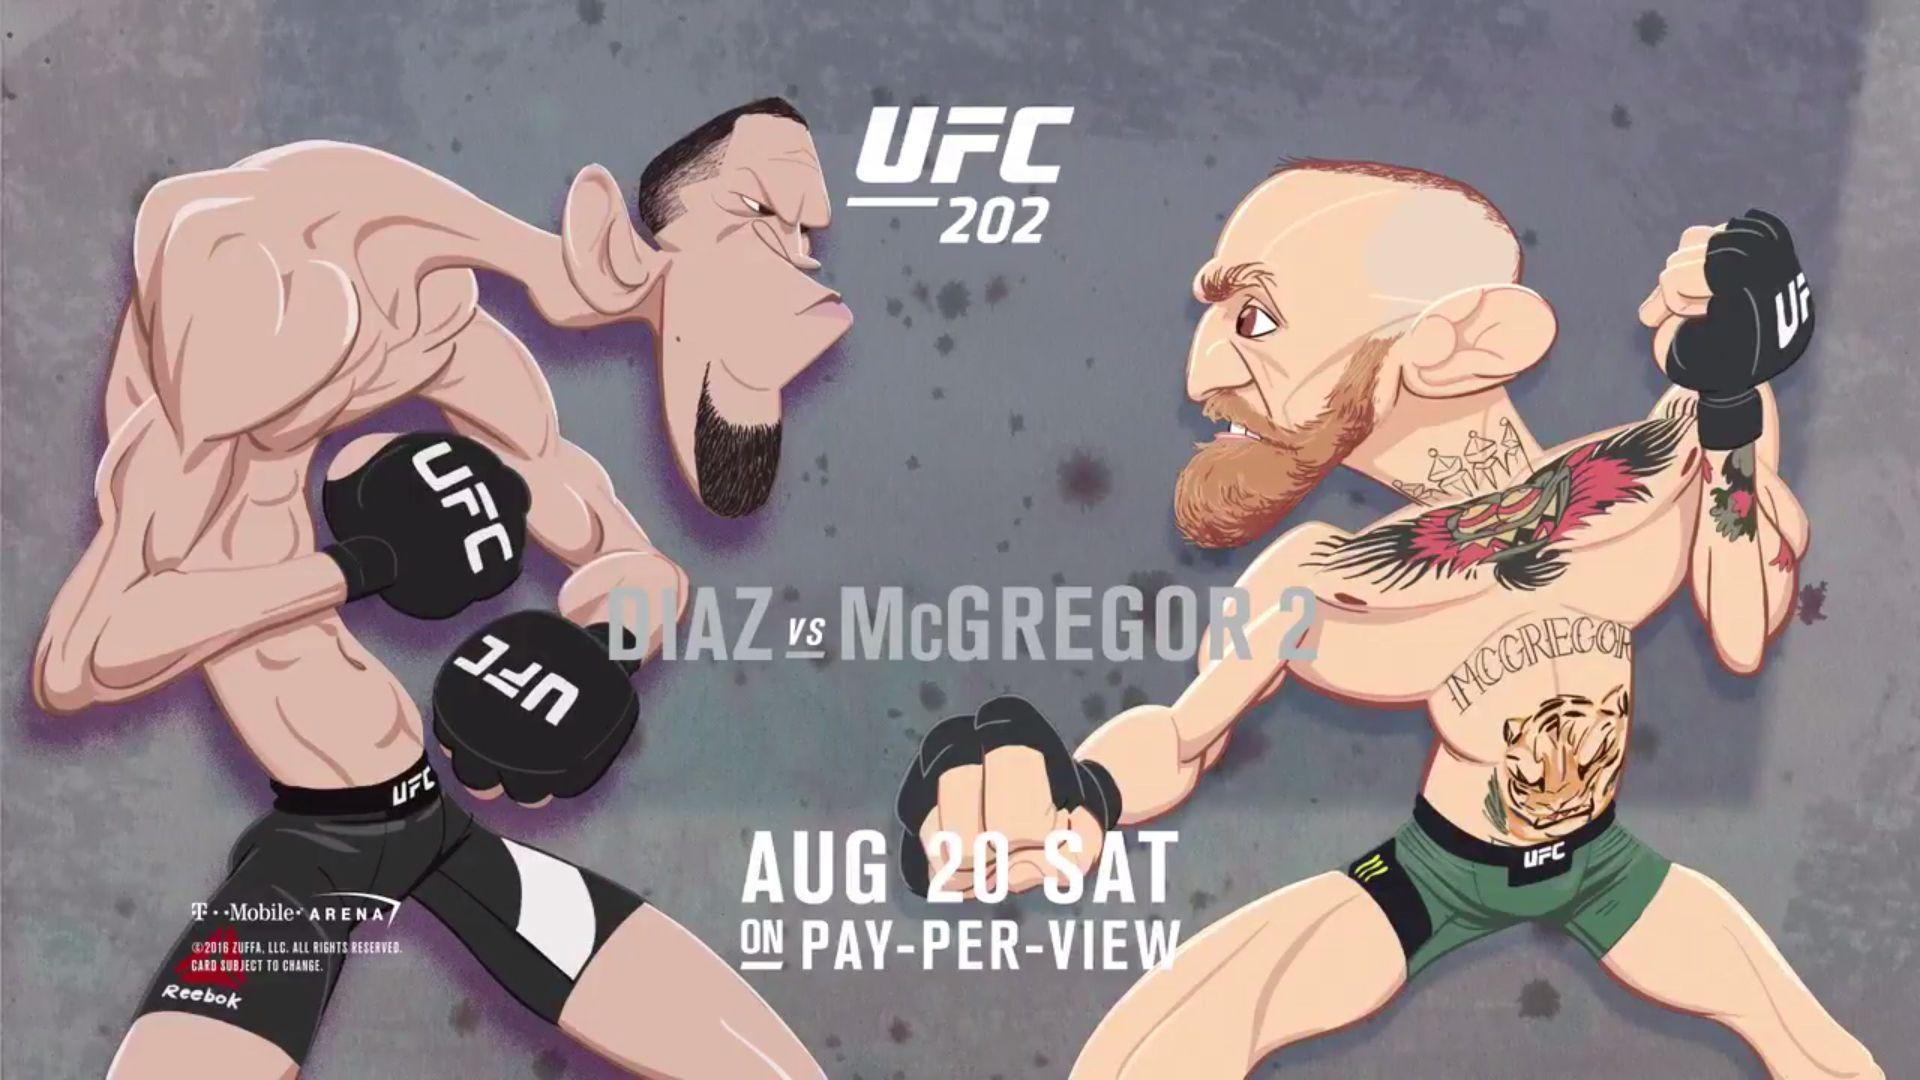 Nate Diaz Vs Conor Mcgregor Cartoon Fight Promo For Ufc202 If You Love Mma Conor Mcgregor Nate Diaz Mma